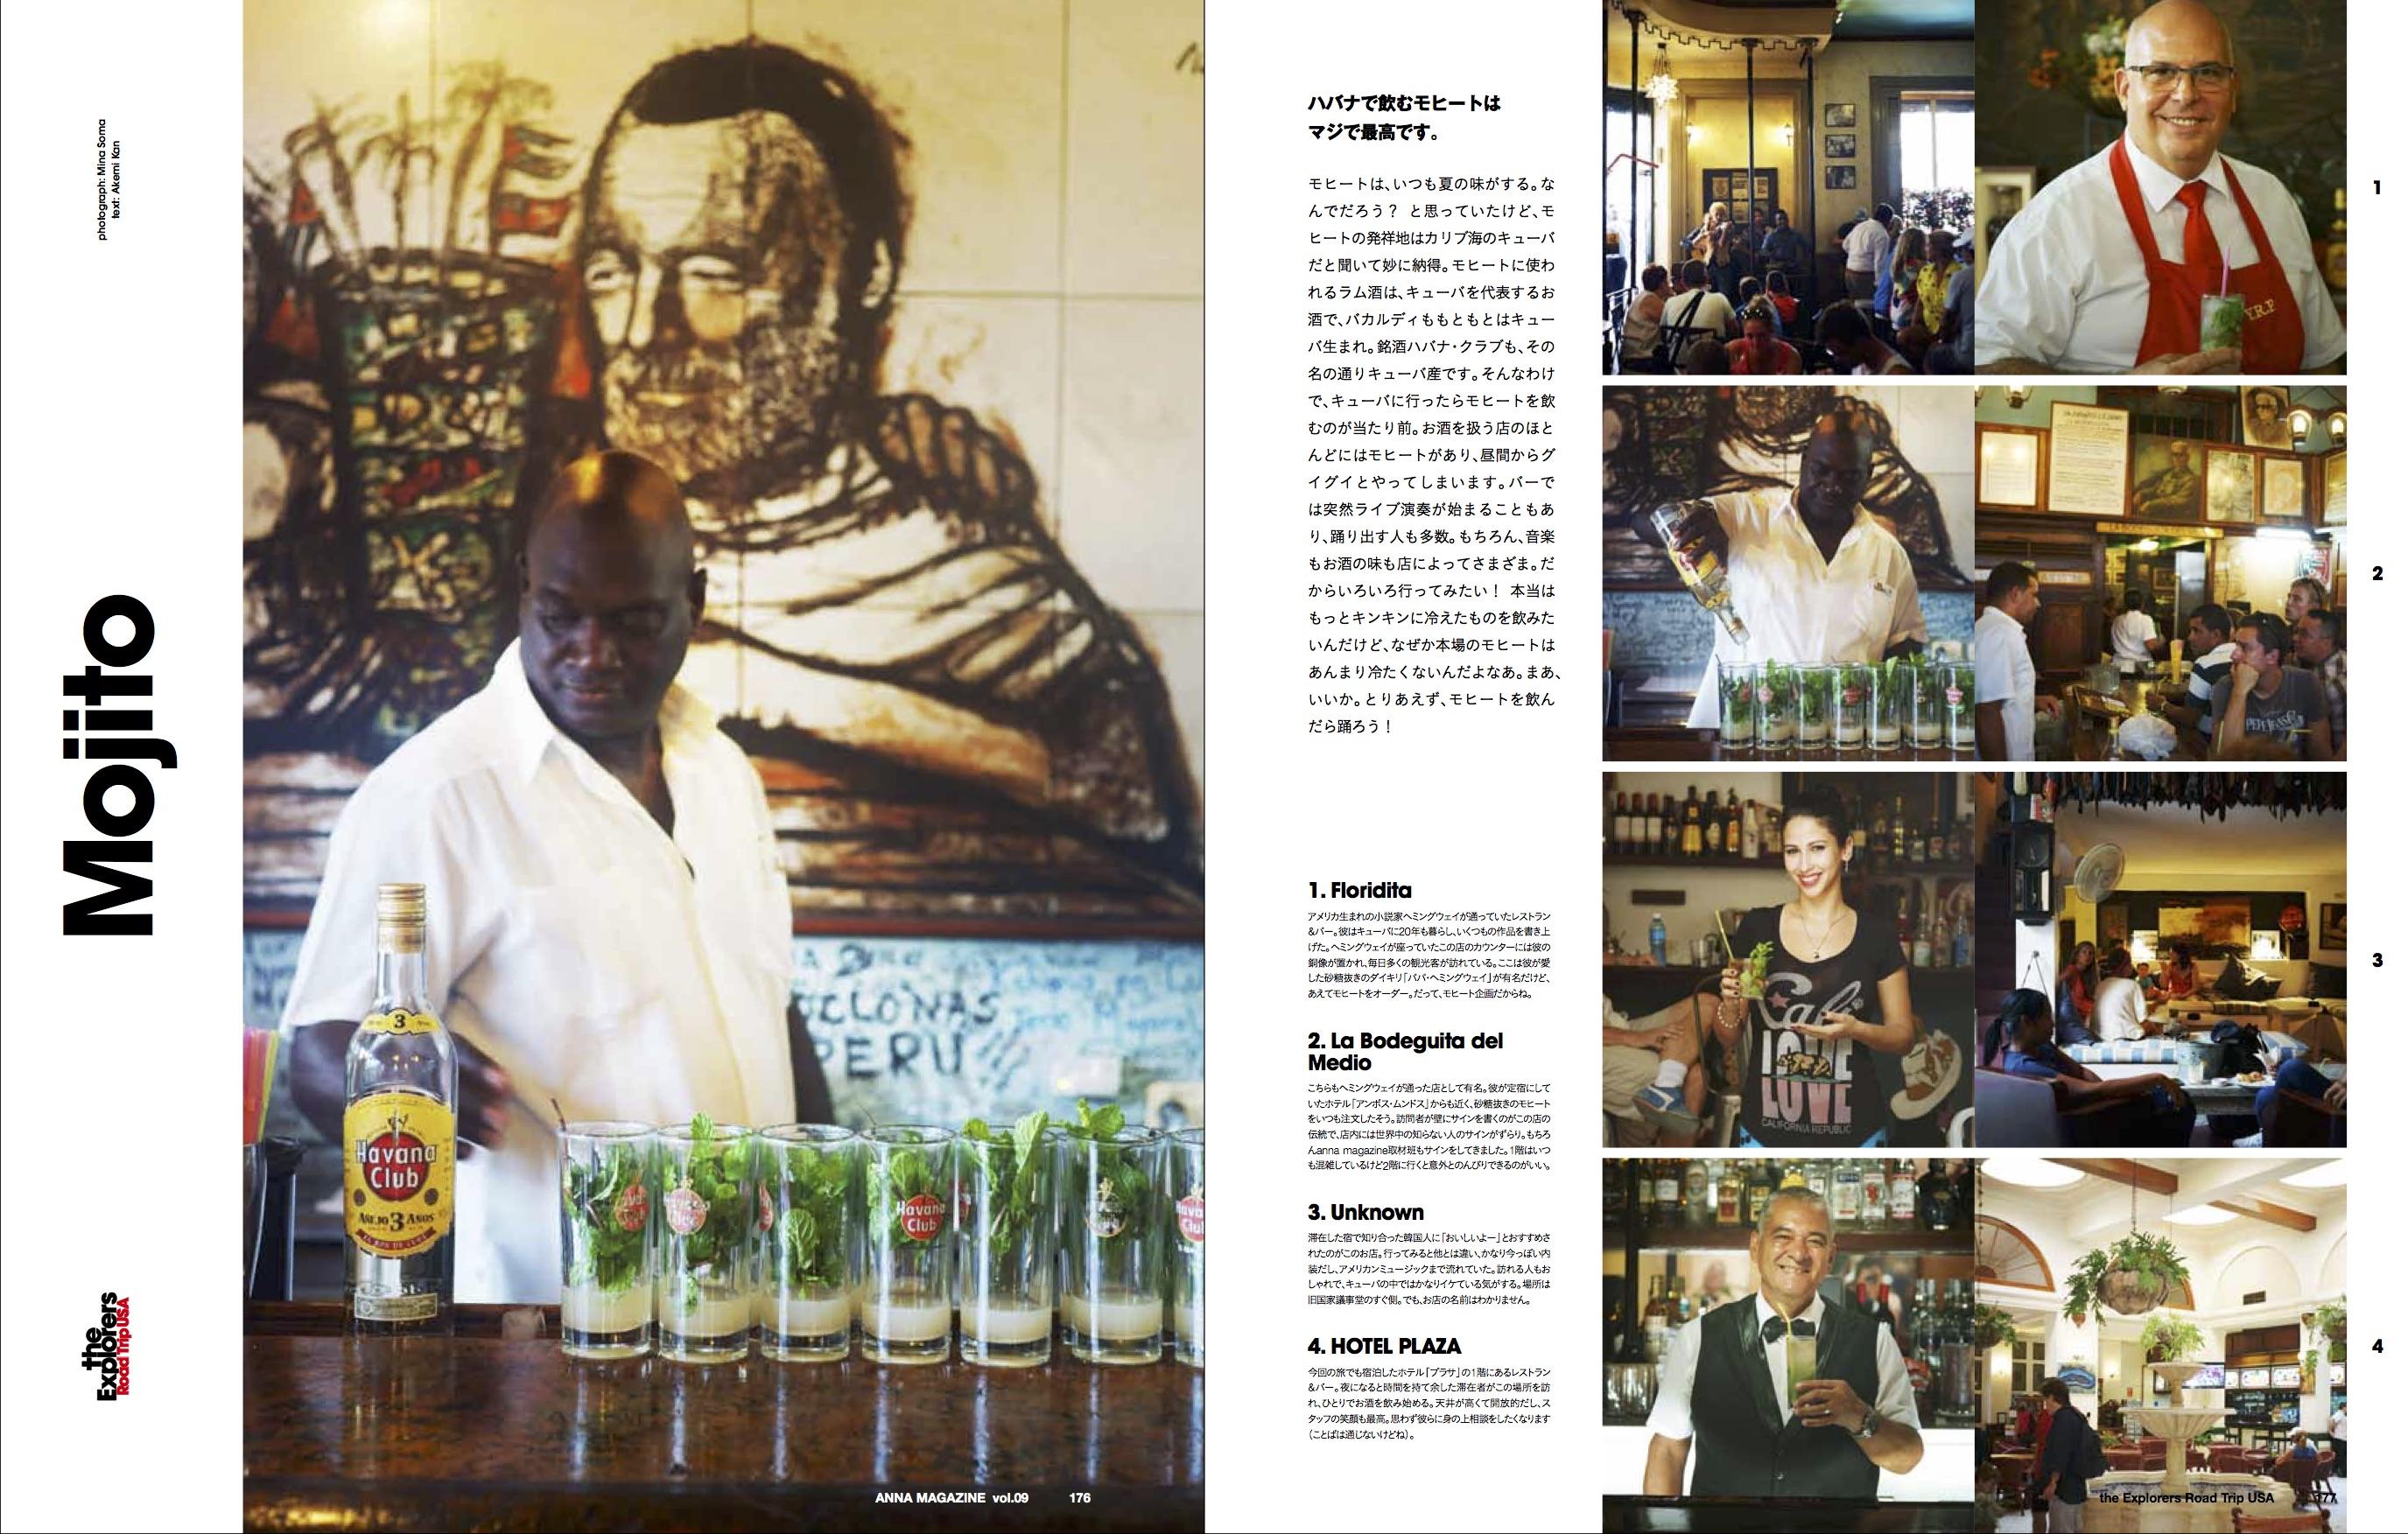 anna magazine vol.9 P88